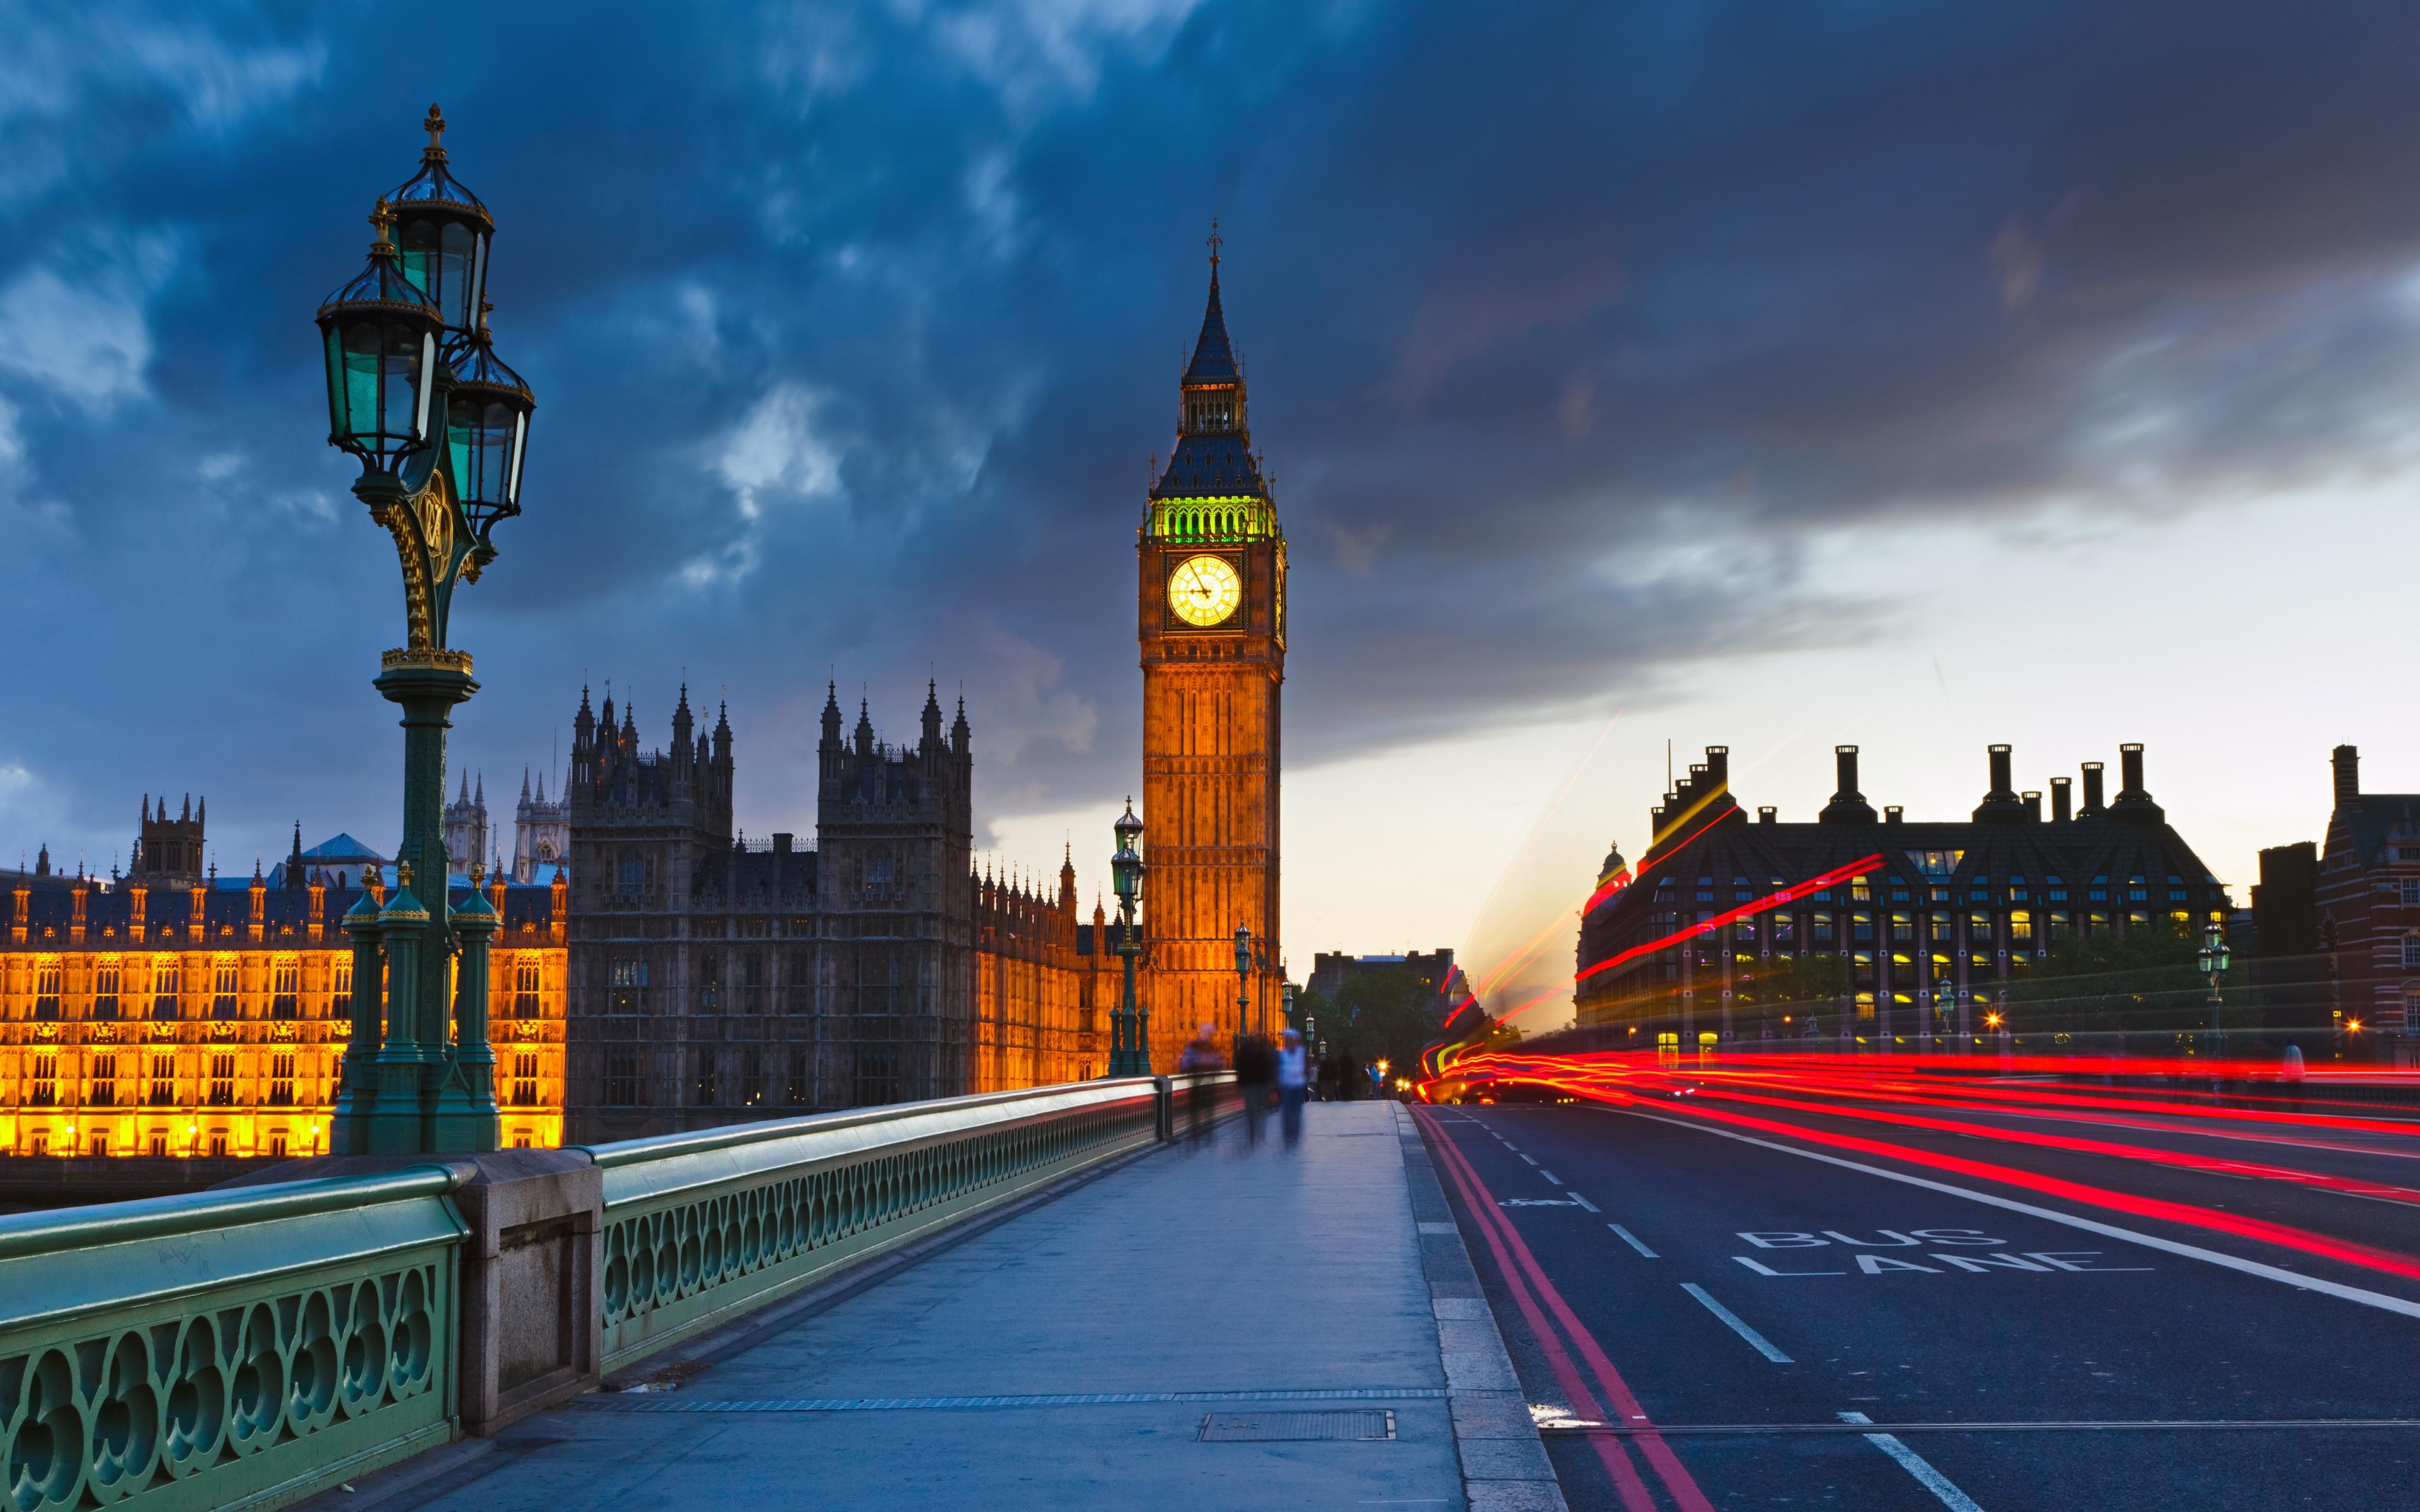 London Big ben Evening Traffic Wallpaper Background Ultra HD 4K 3840x2400